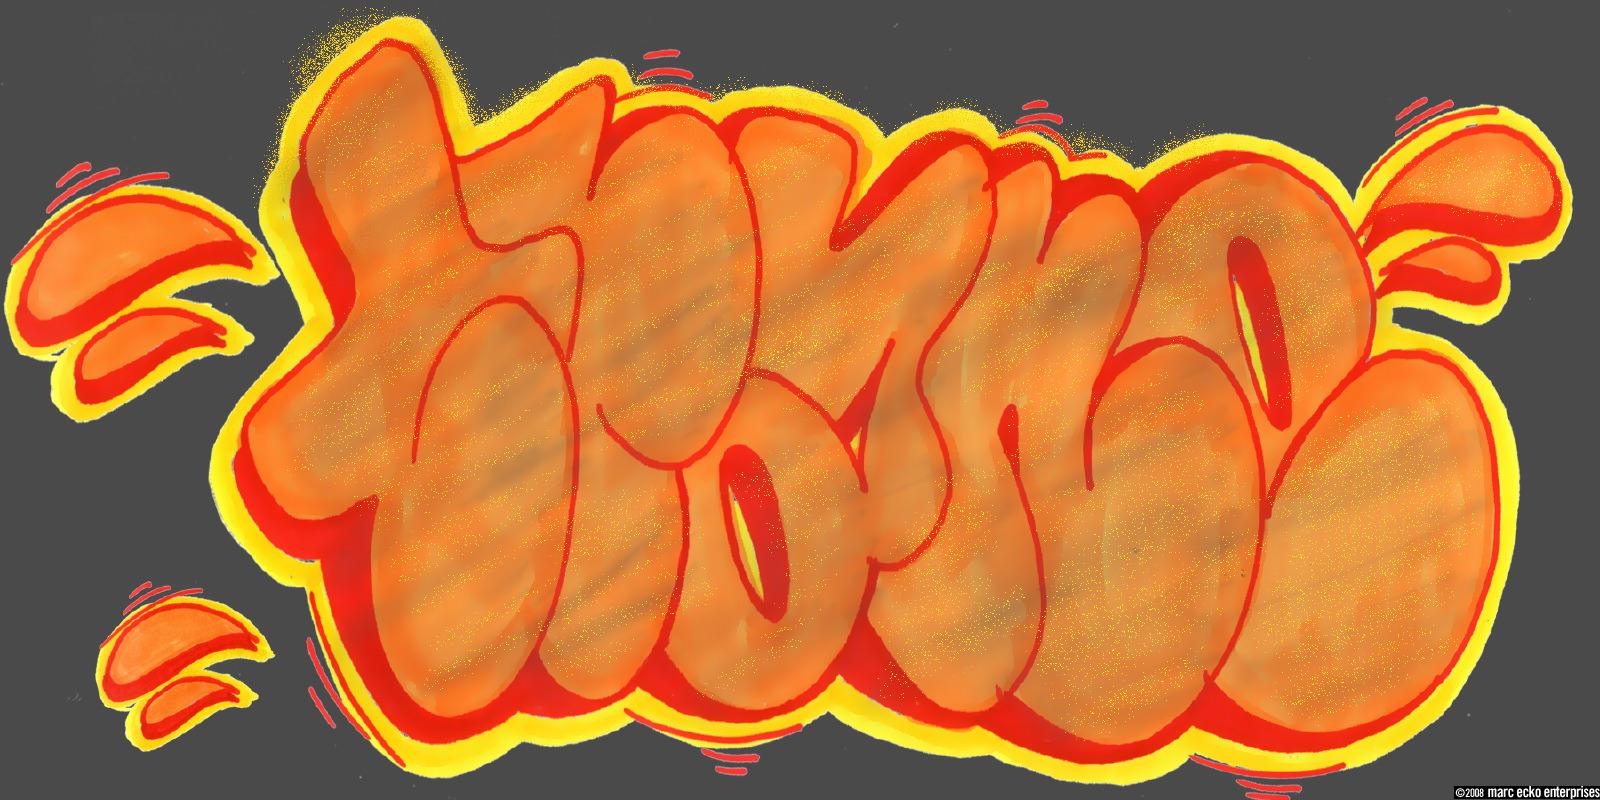 Diposkan oleh seni graffiti di 04.55